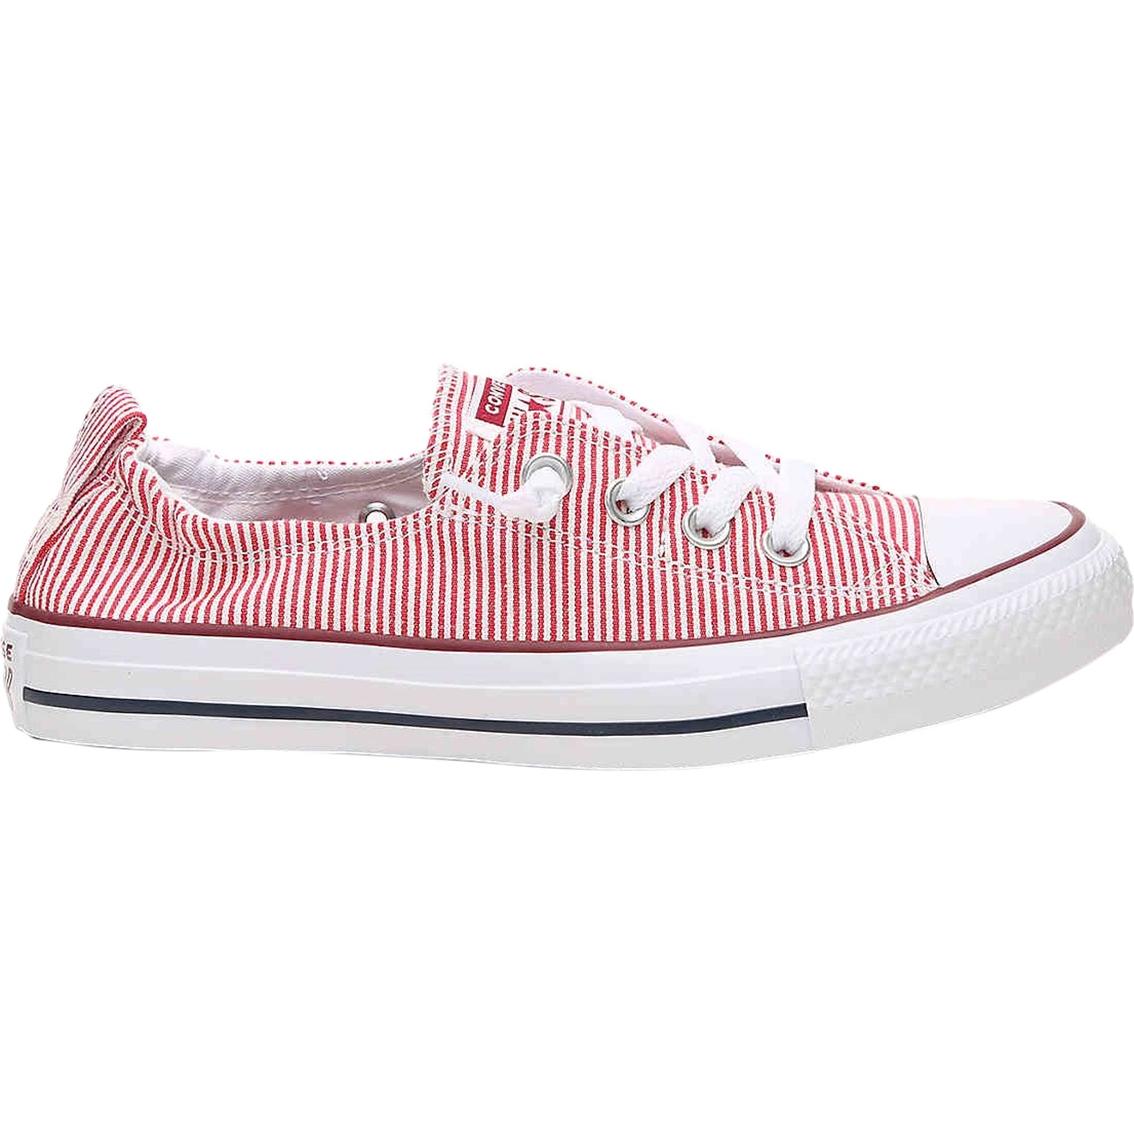 601bcbb0299e Converse Women s Chuck Taylor All Stars Shoreline Slip Gym Shoes ...